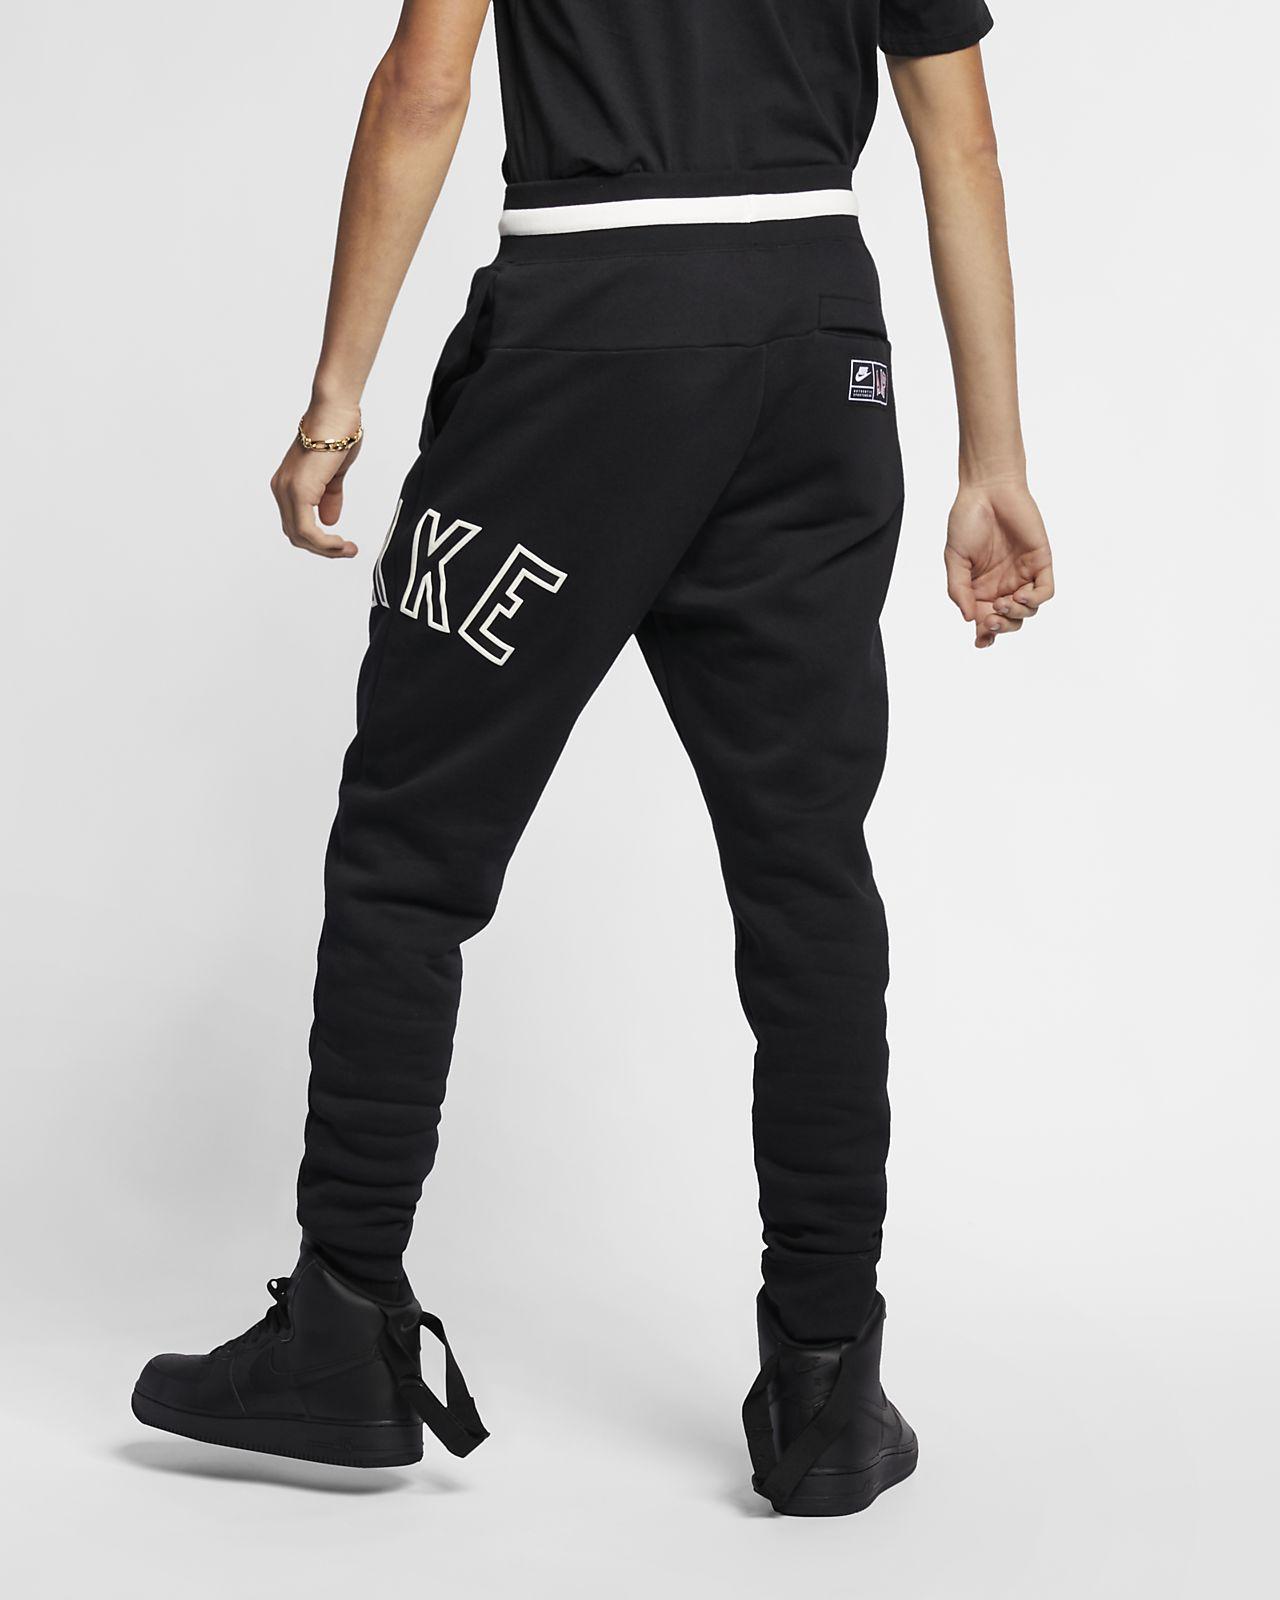 537c4de11c65ab Nike Air Men s Fleece Trousers. Nike.com ID